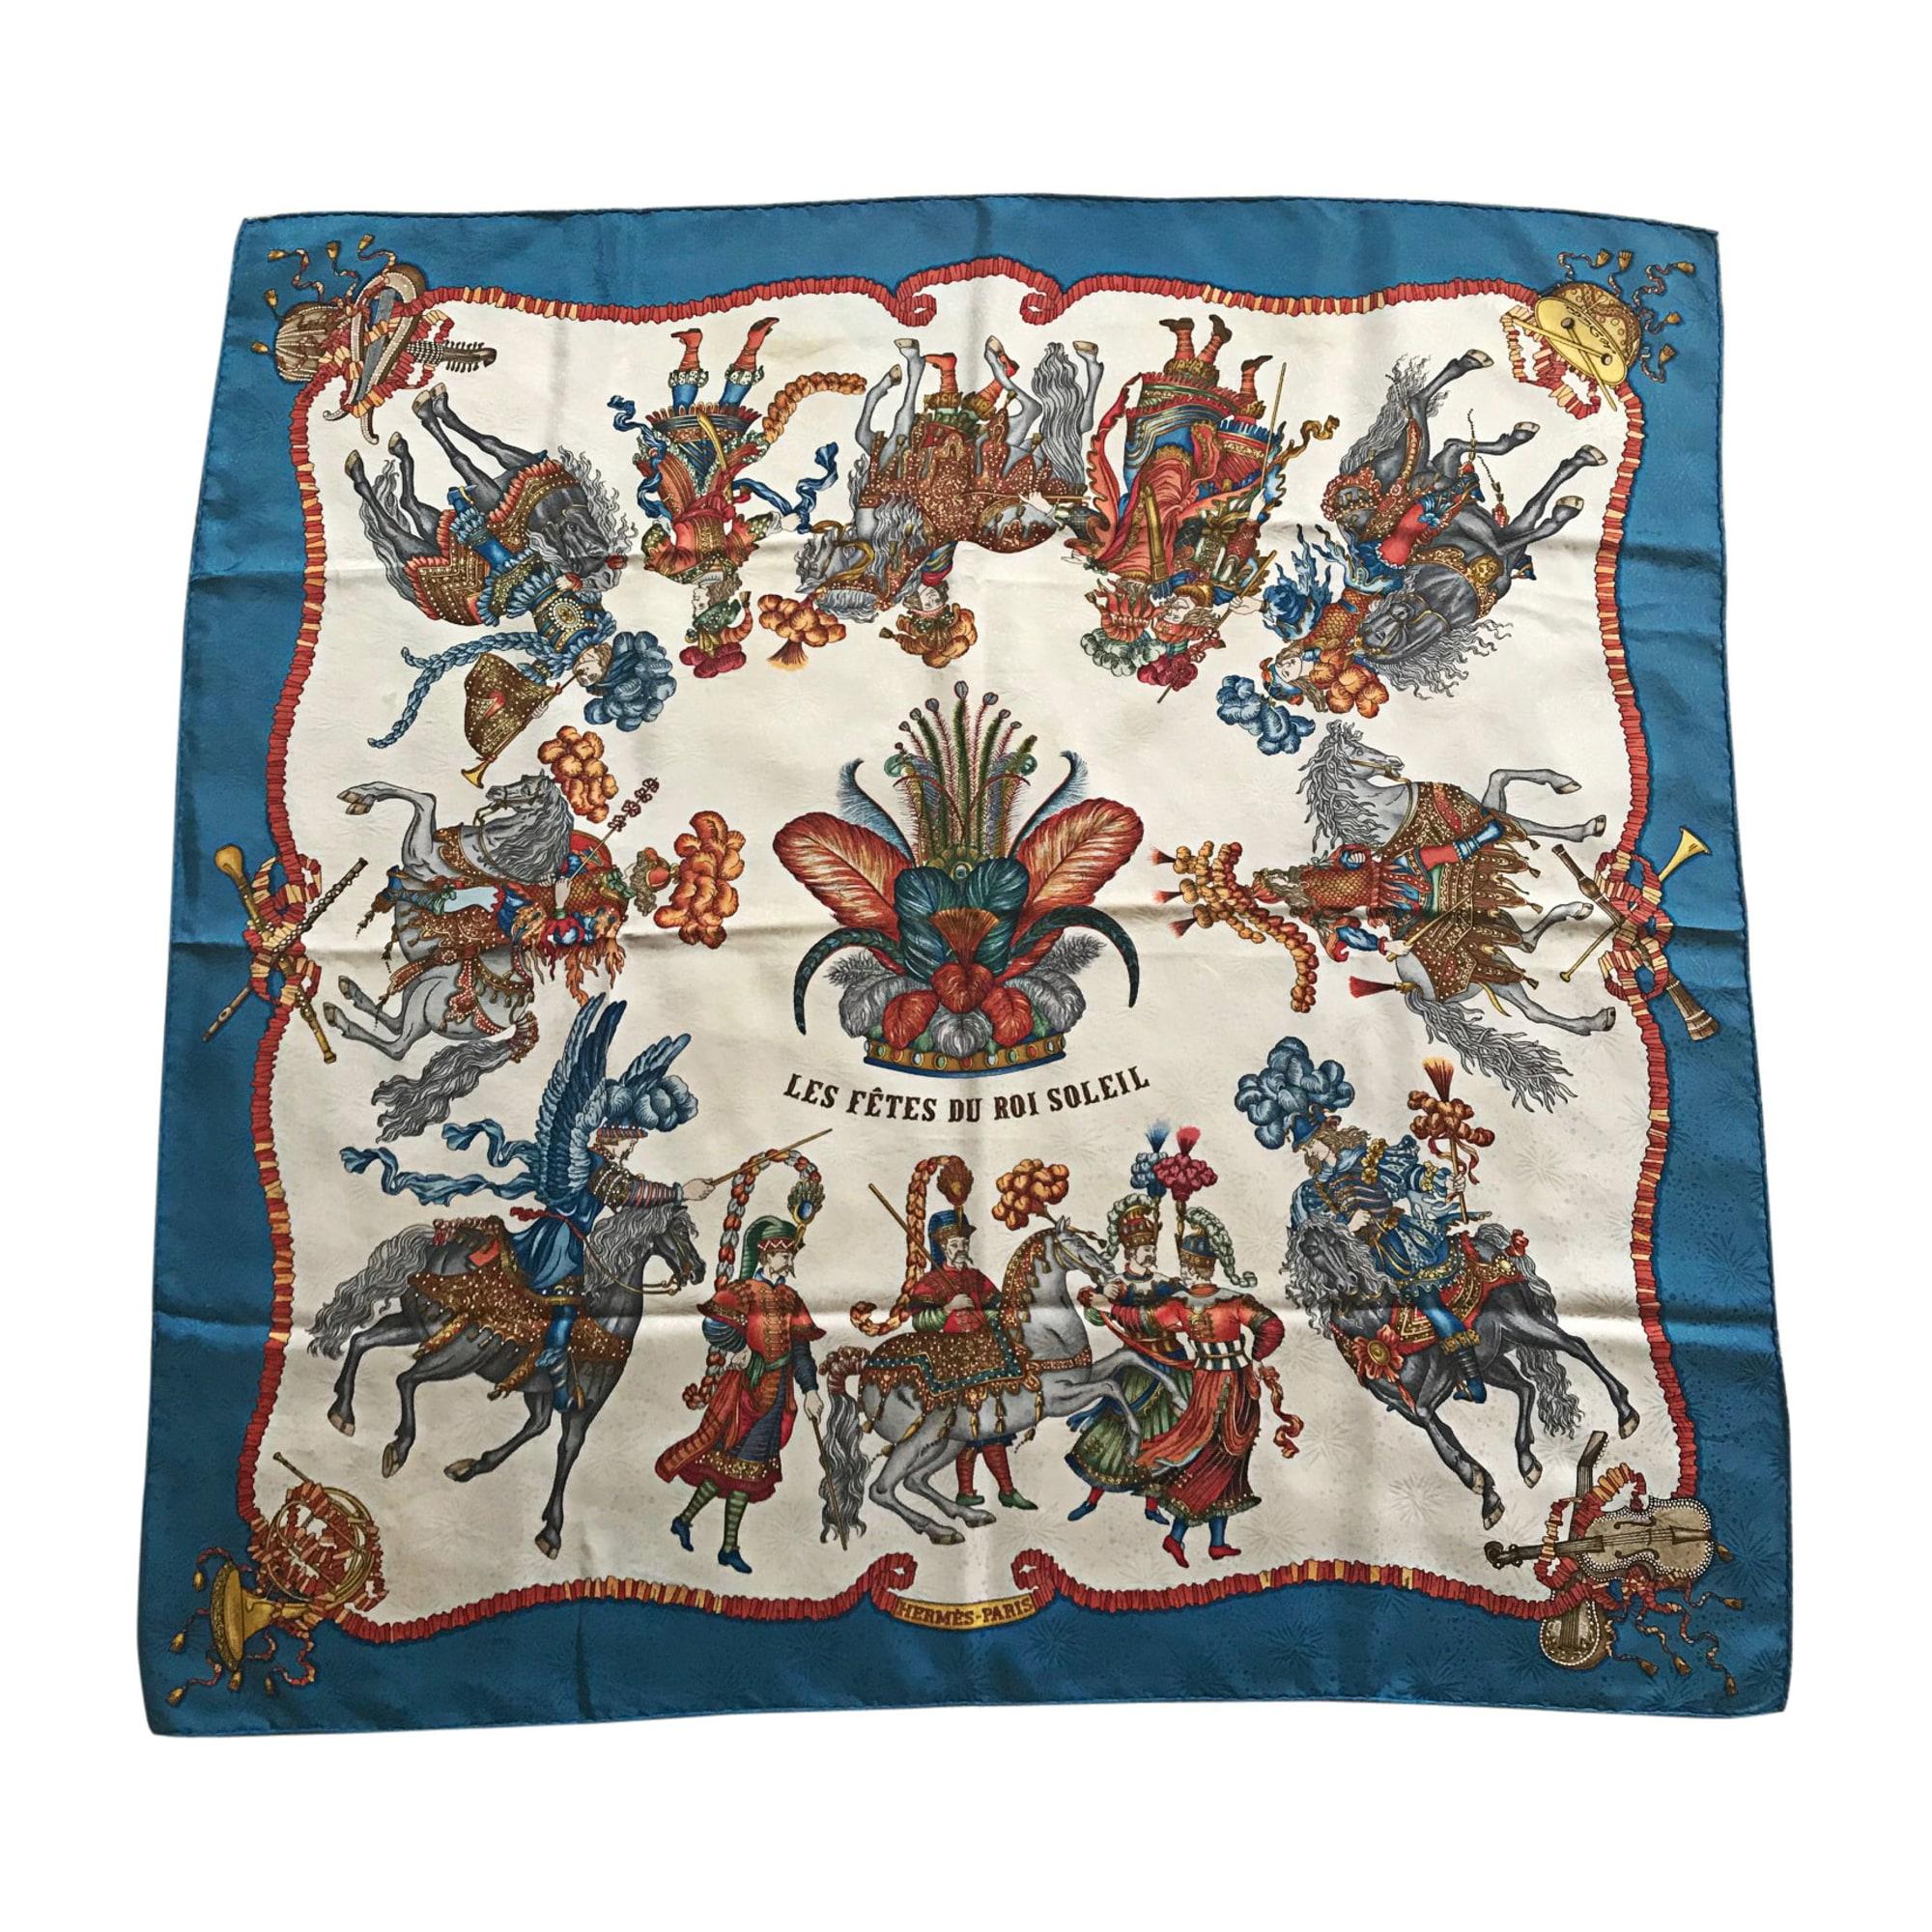 3781852ab15 Foulard HERMÈS carr bleu vendu par D annabelle 5135064 - 7694906